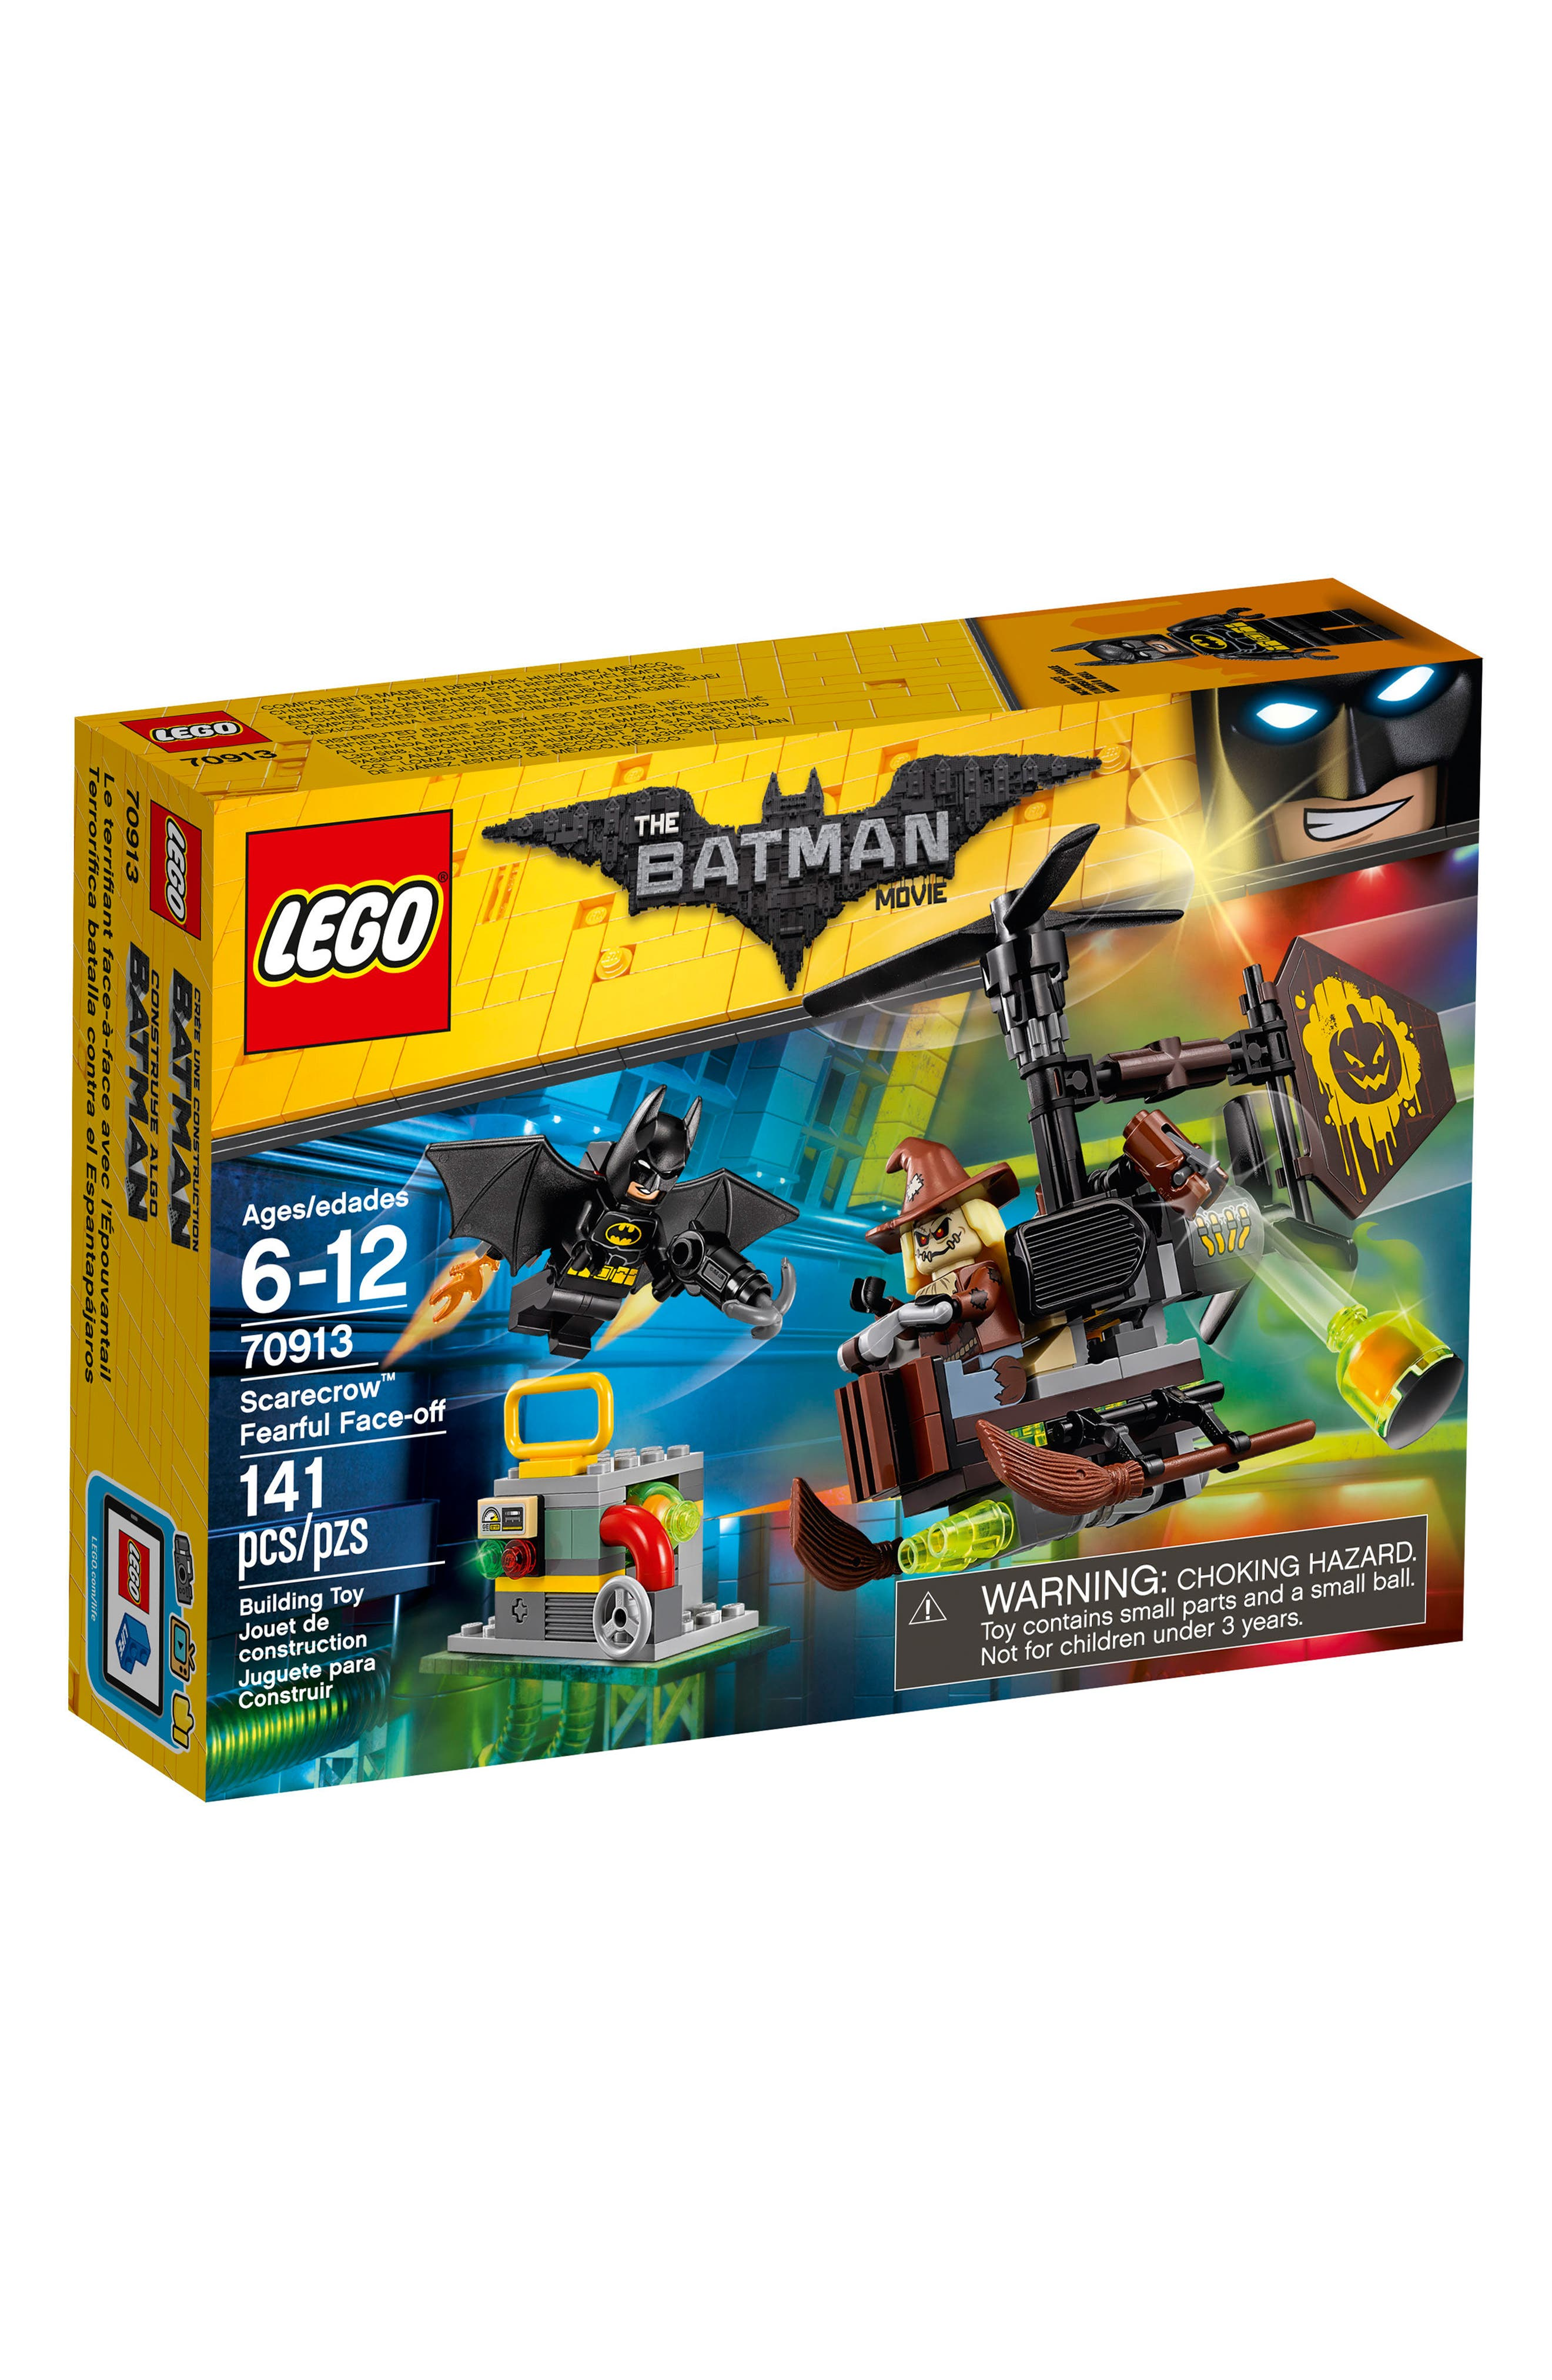 Main Image - LEGO® THE LEGO® BATMAN MOVIE: Scarecrow™ Fearful Face-Off Set - 70913